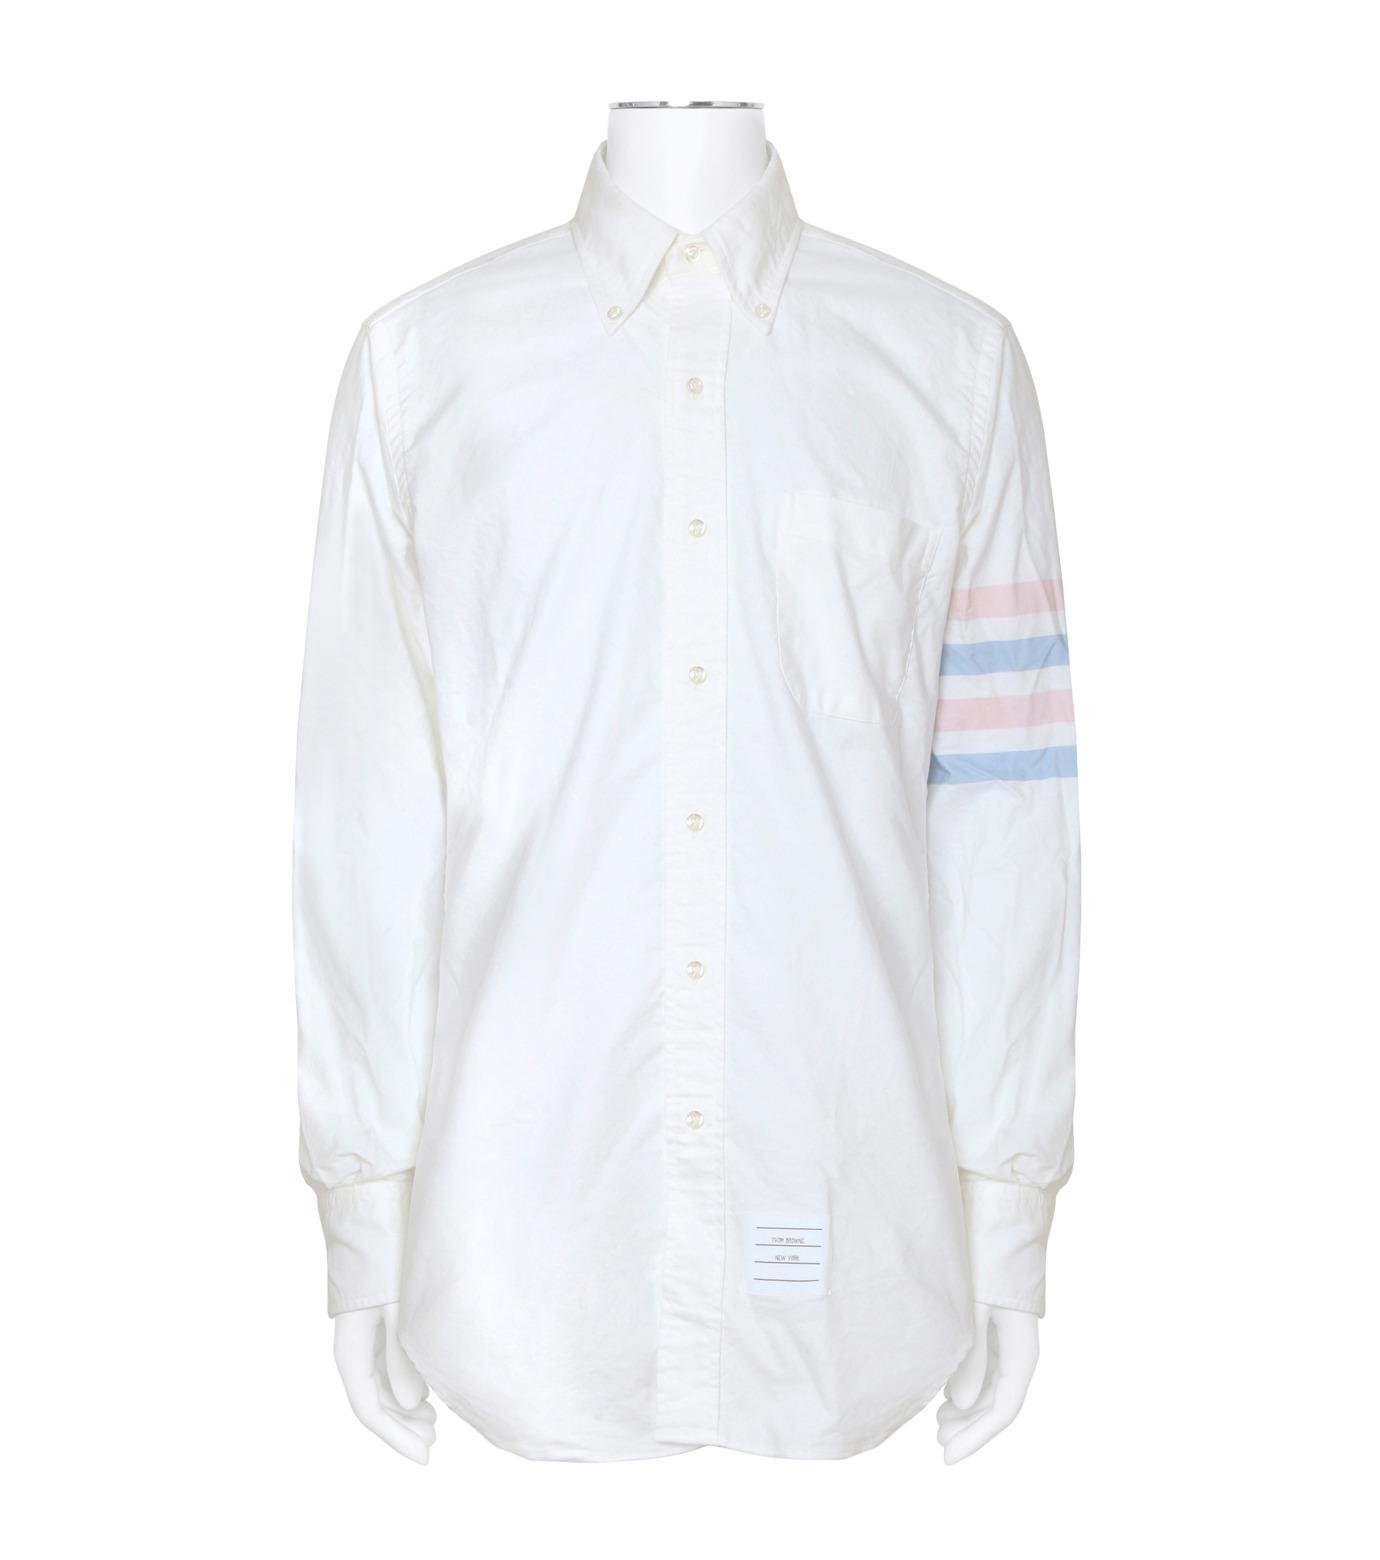 Thom Browne(トムブラウン)のStripe Oxford Shirt-WHITE(シャツ/shirt)-MWL001A00245-4 拡大詳細画像1